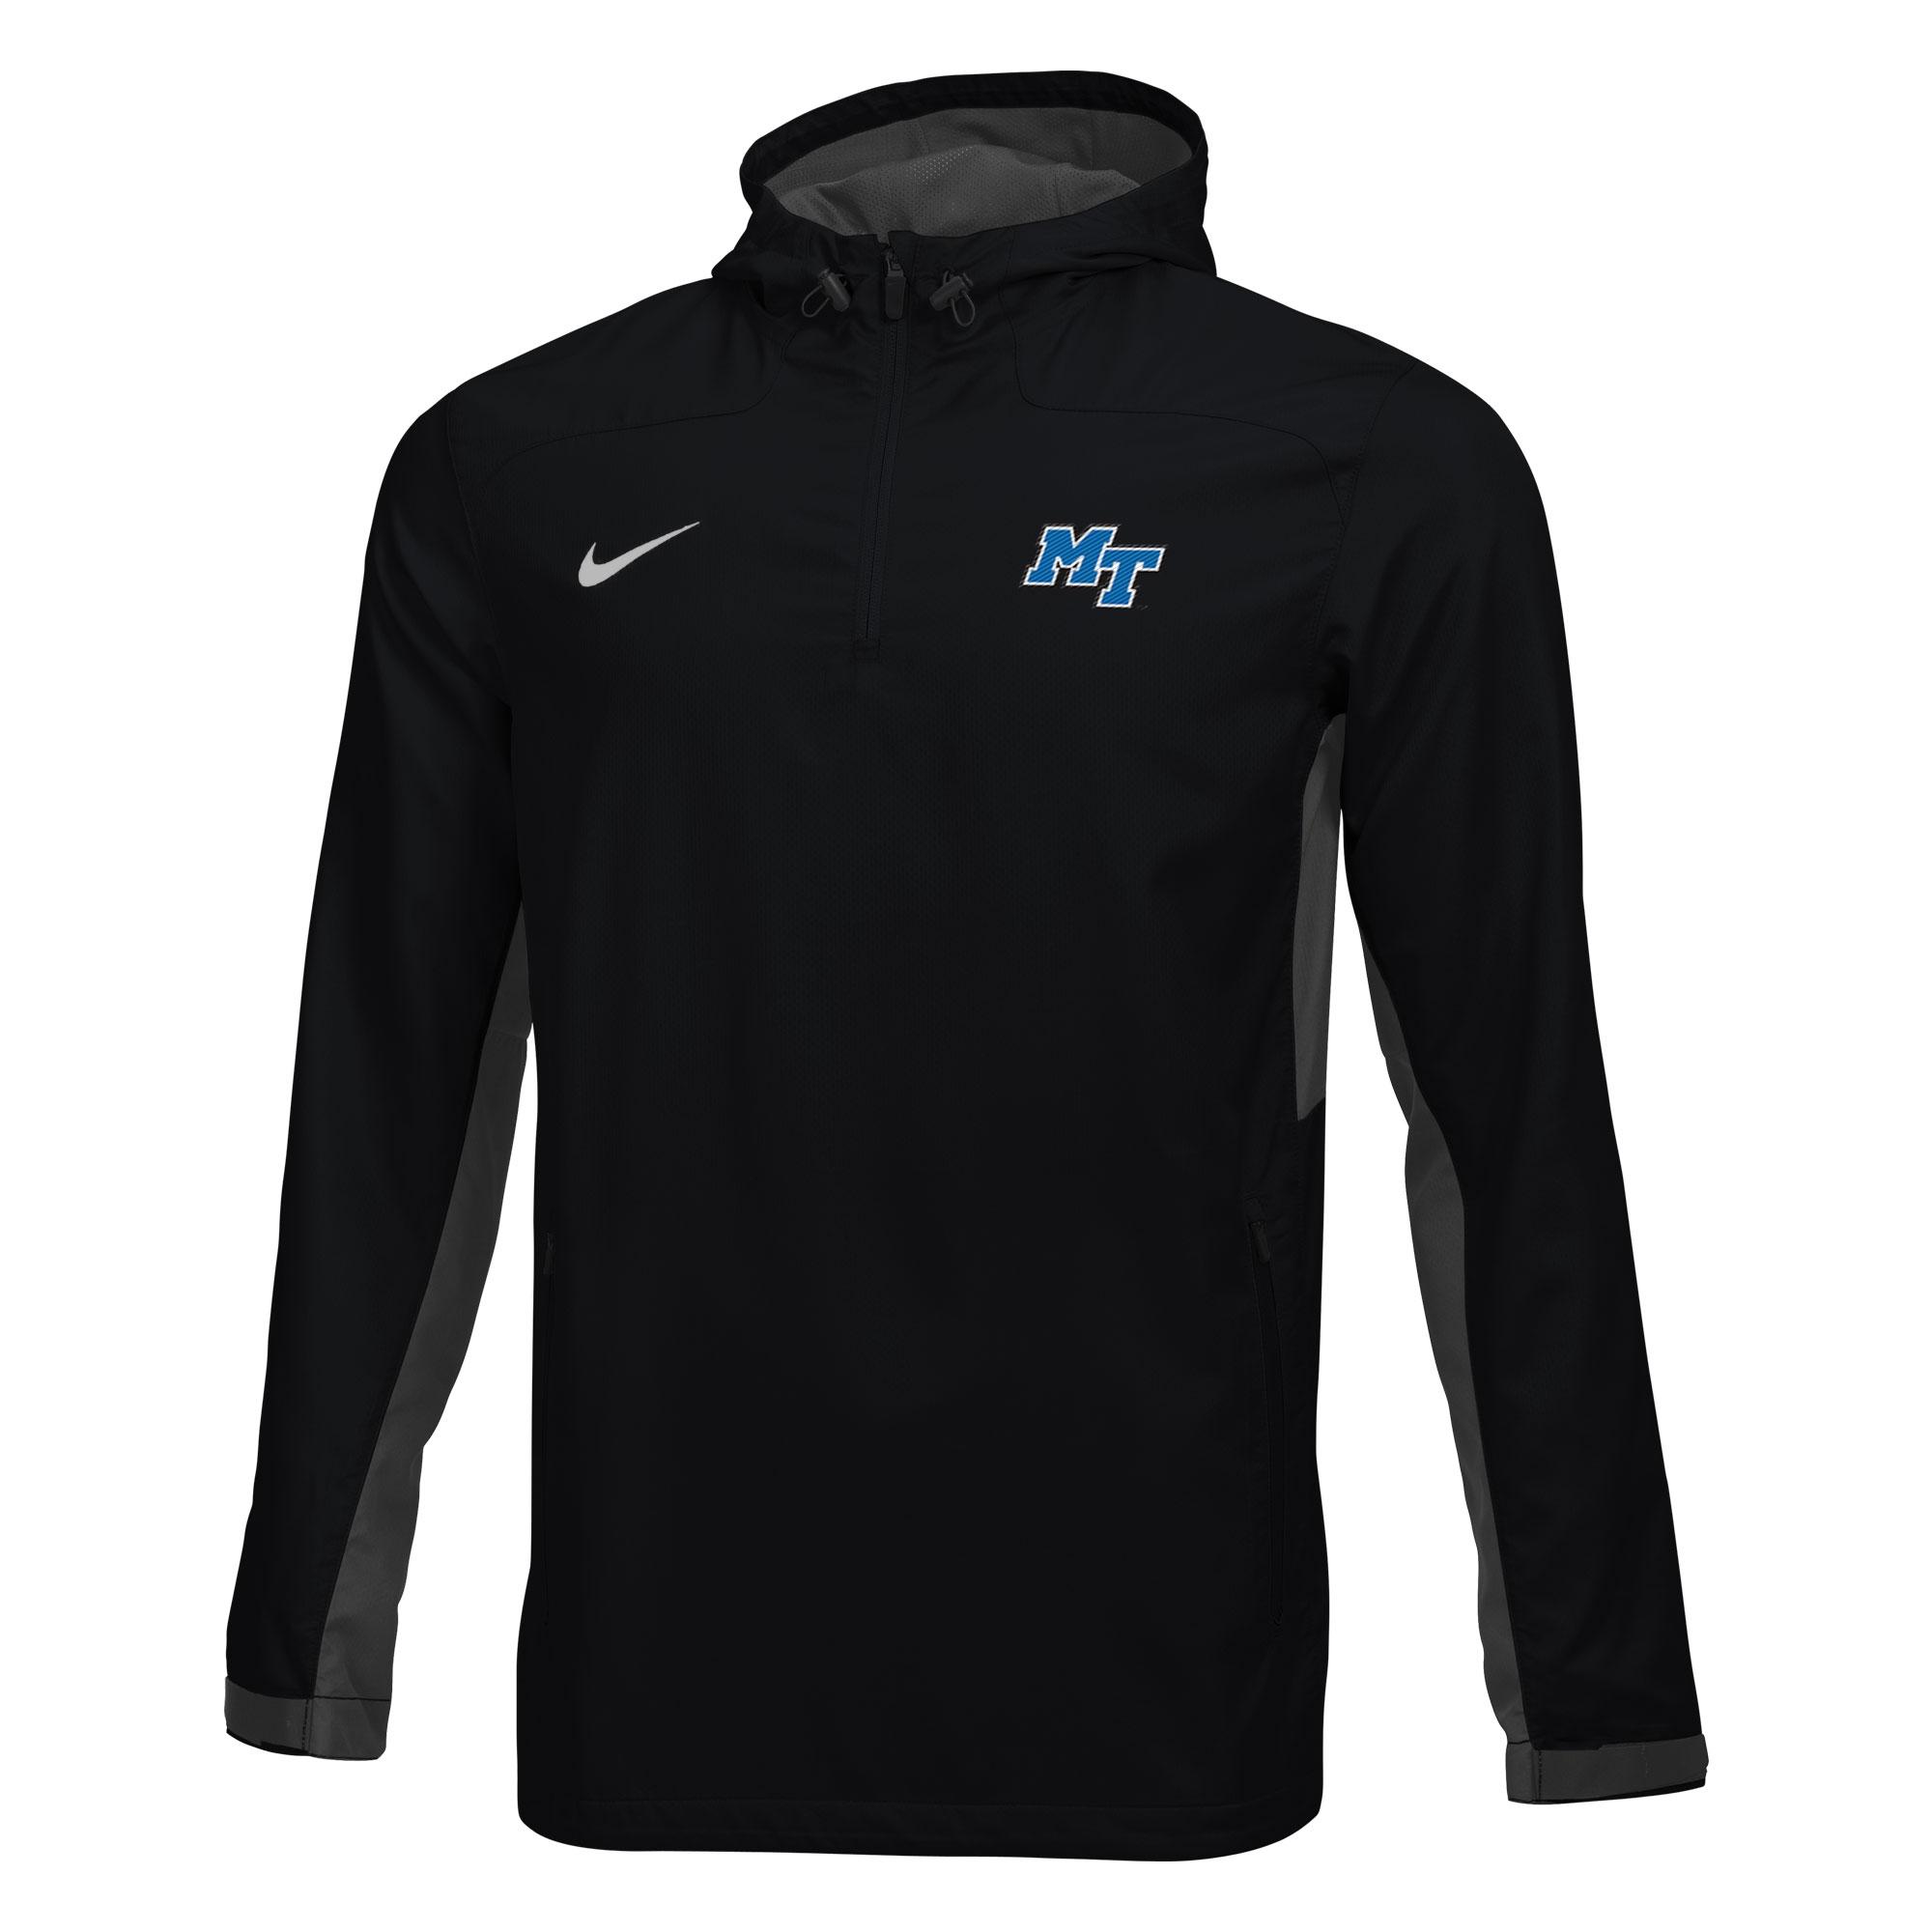 MT Logo Woven 1/4 Zip Hooded Jacket